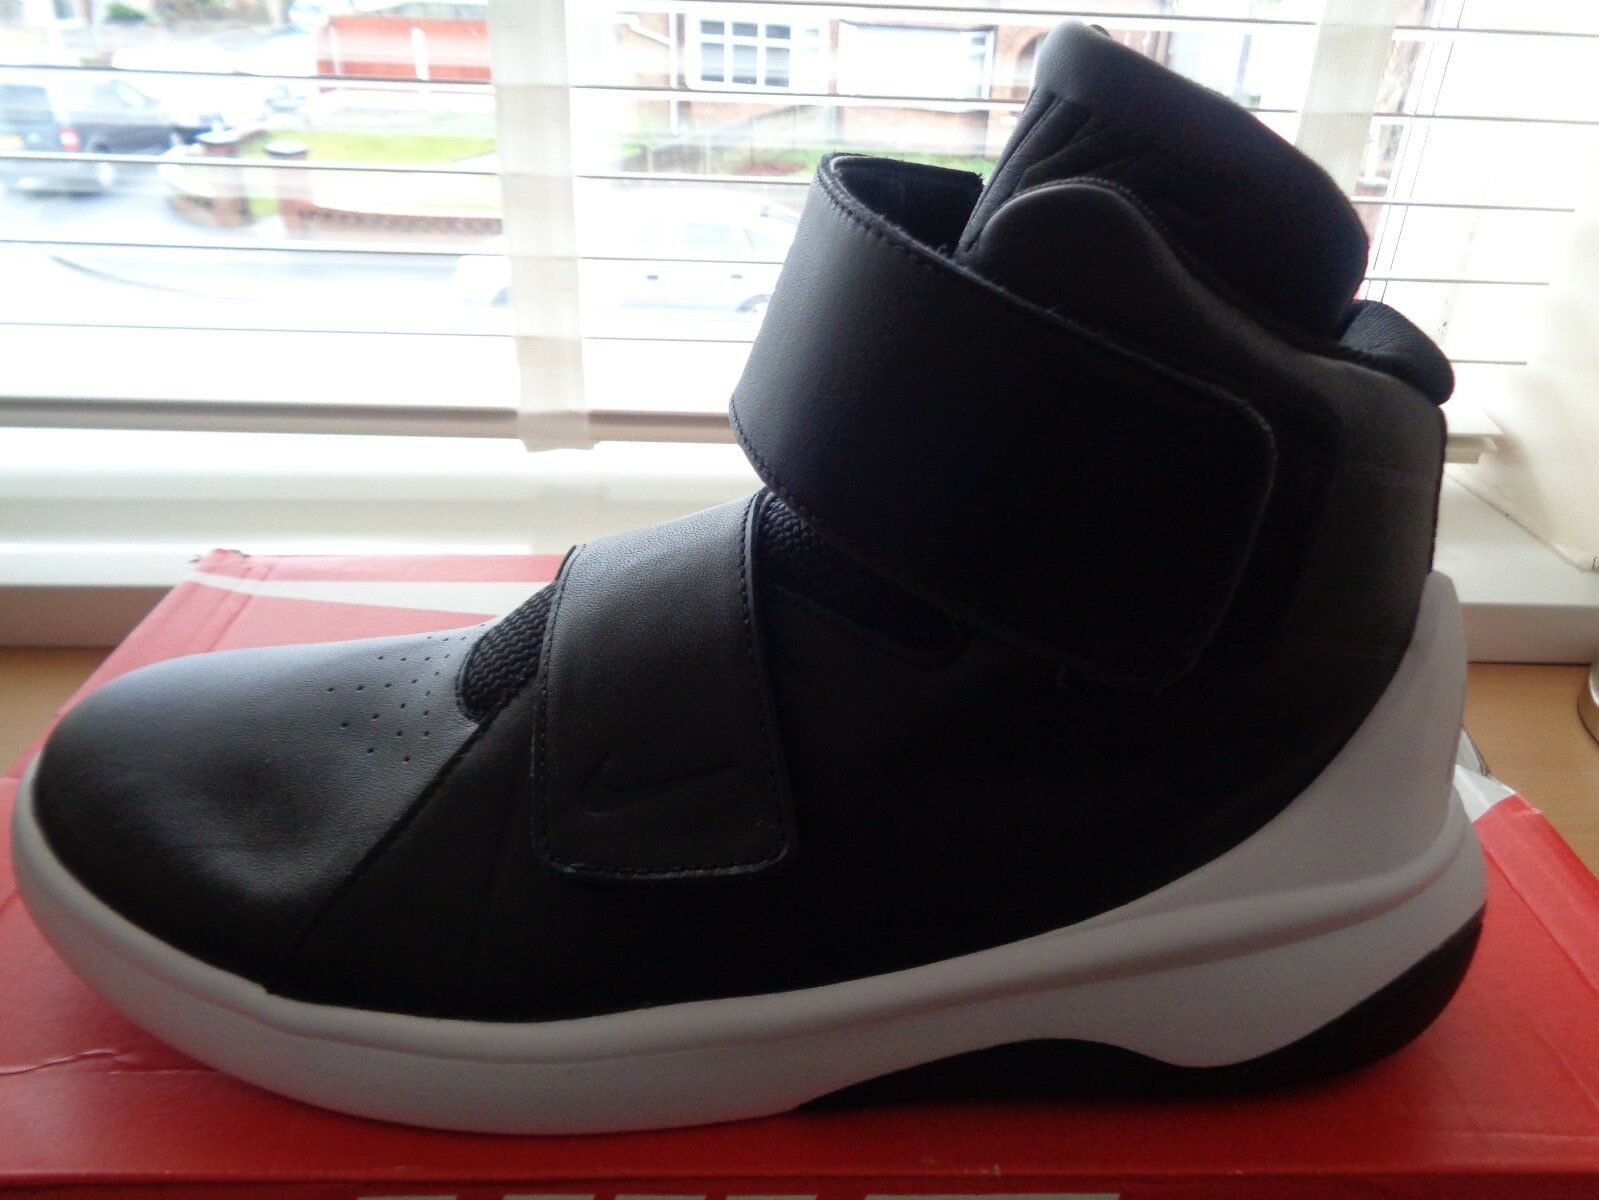 Nike Marxman Para hombre zapatilla de deportebota 832764 001 UK 8.5 EU 43 nos 9.5 Nuevo + Caja